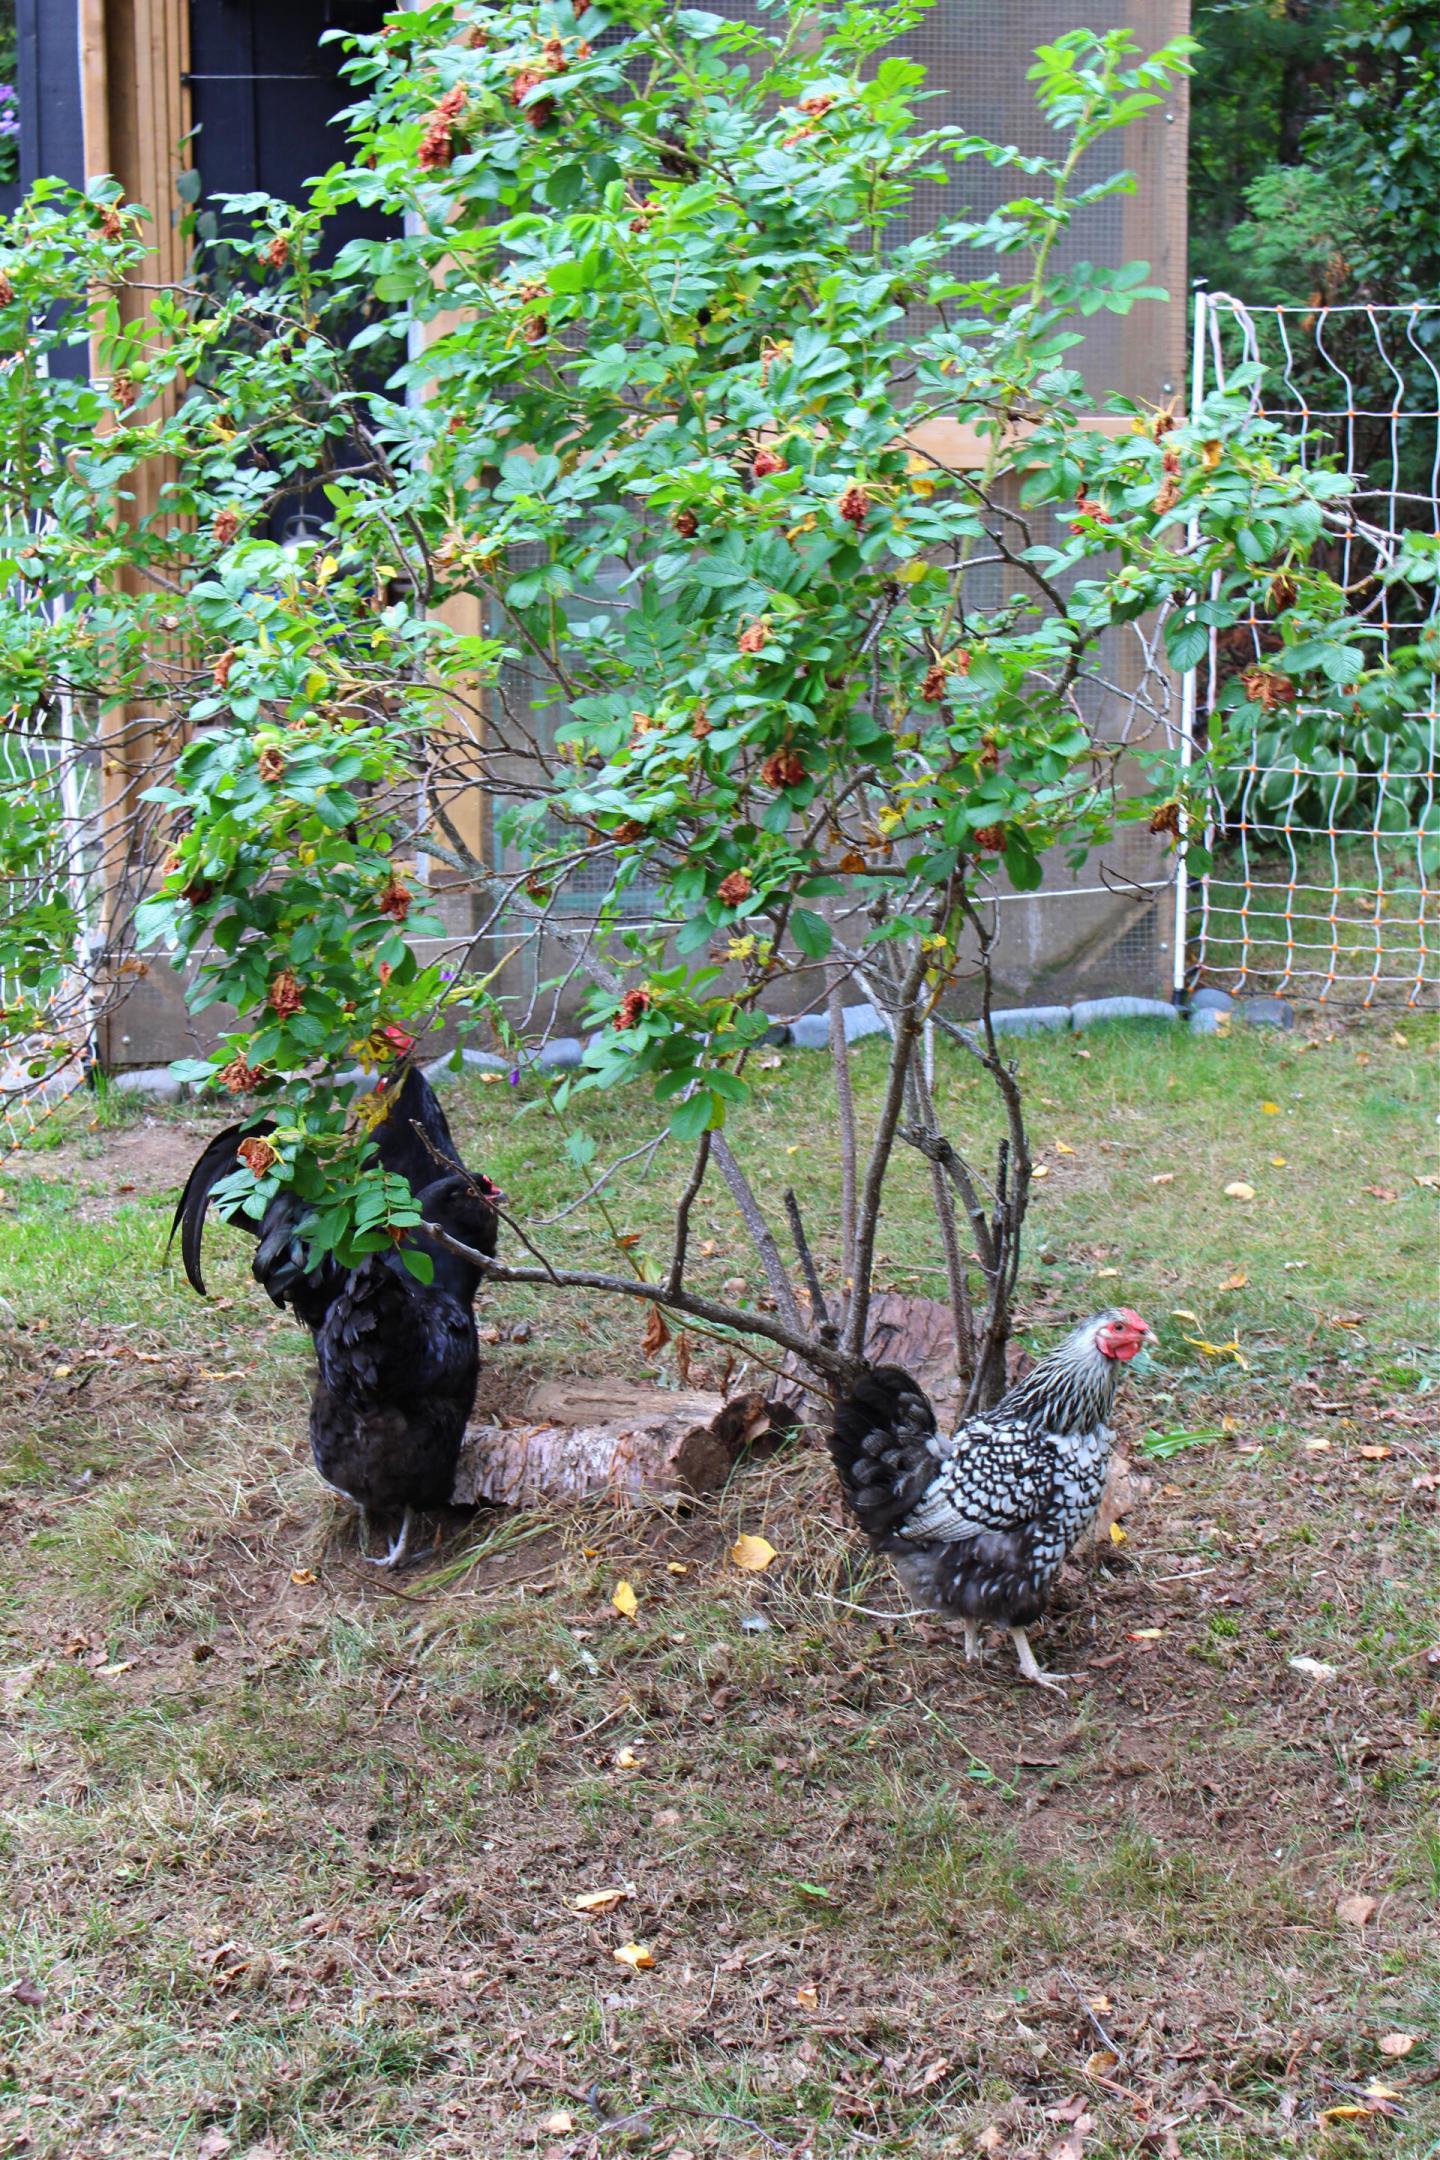 Chickens Under a Rose Bush